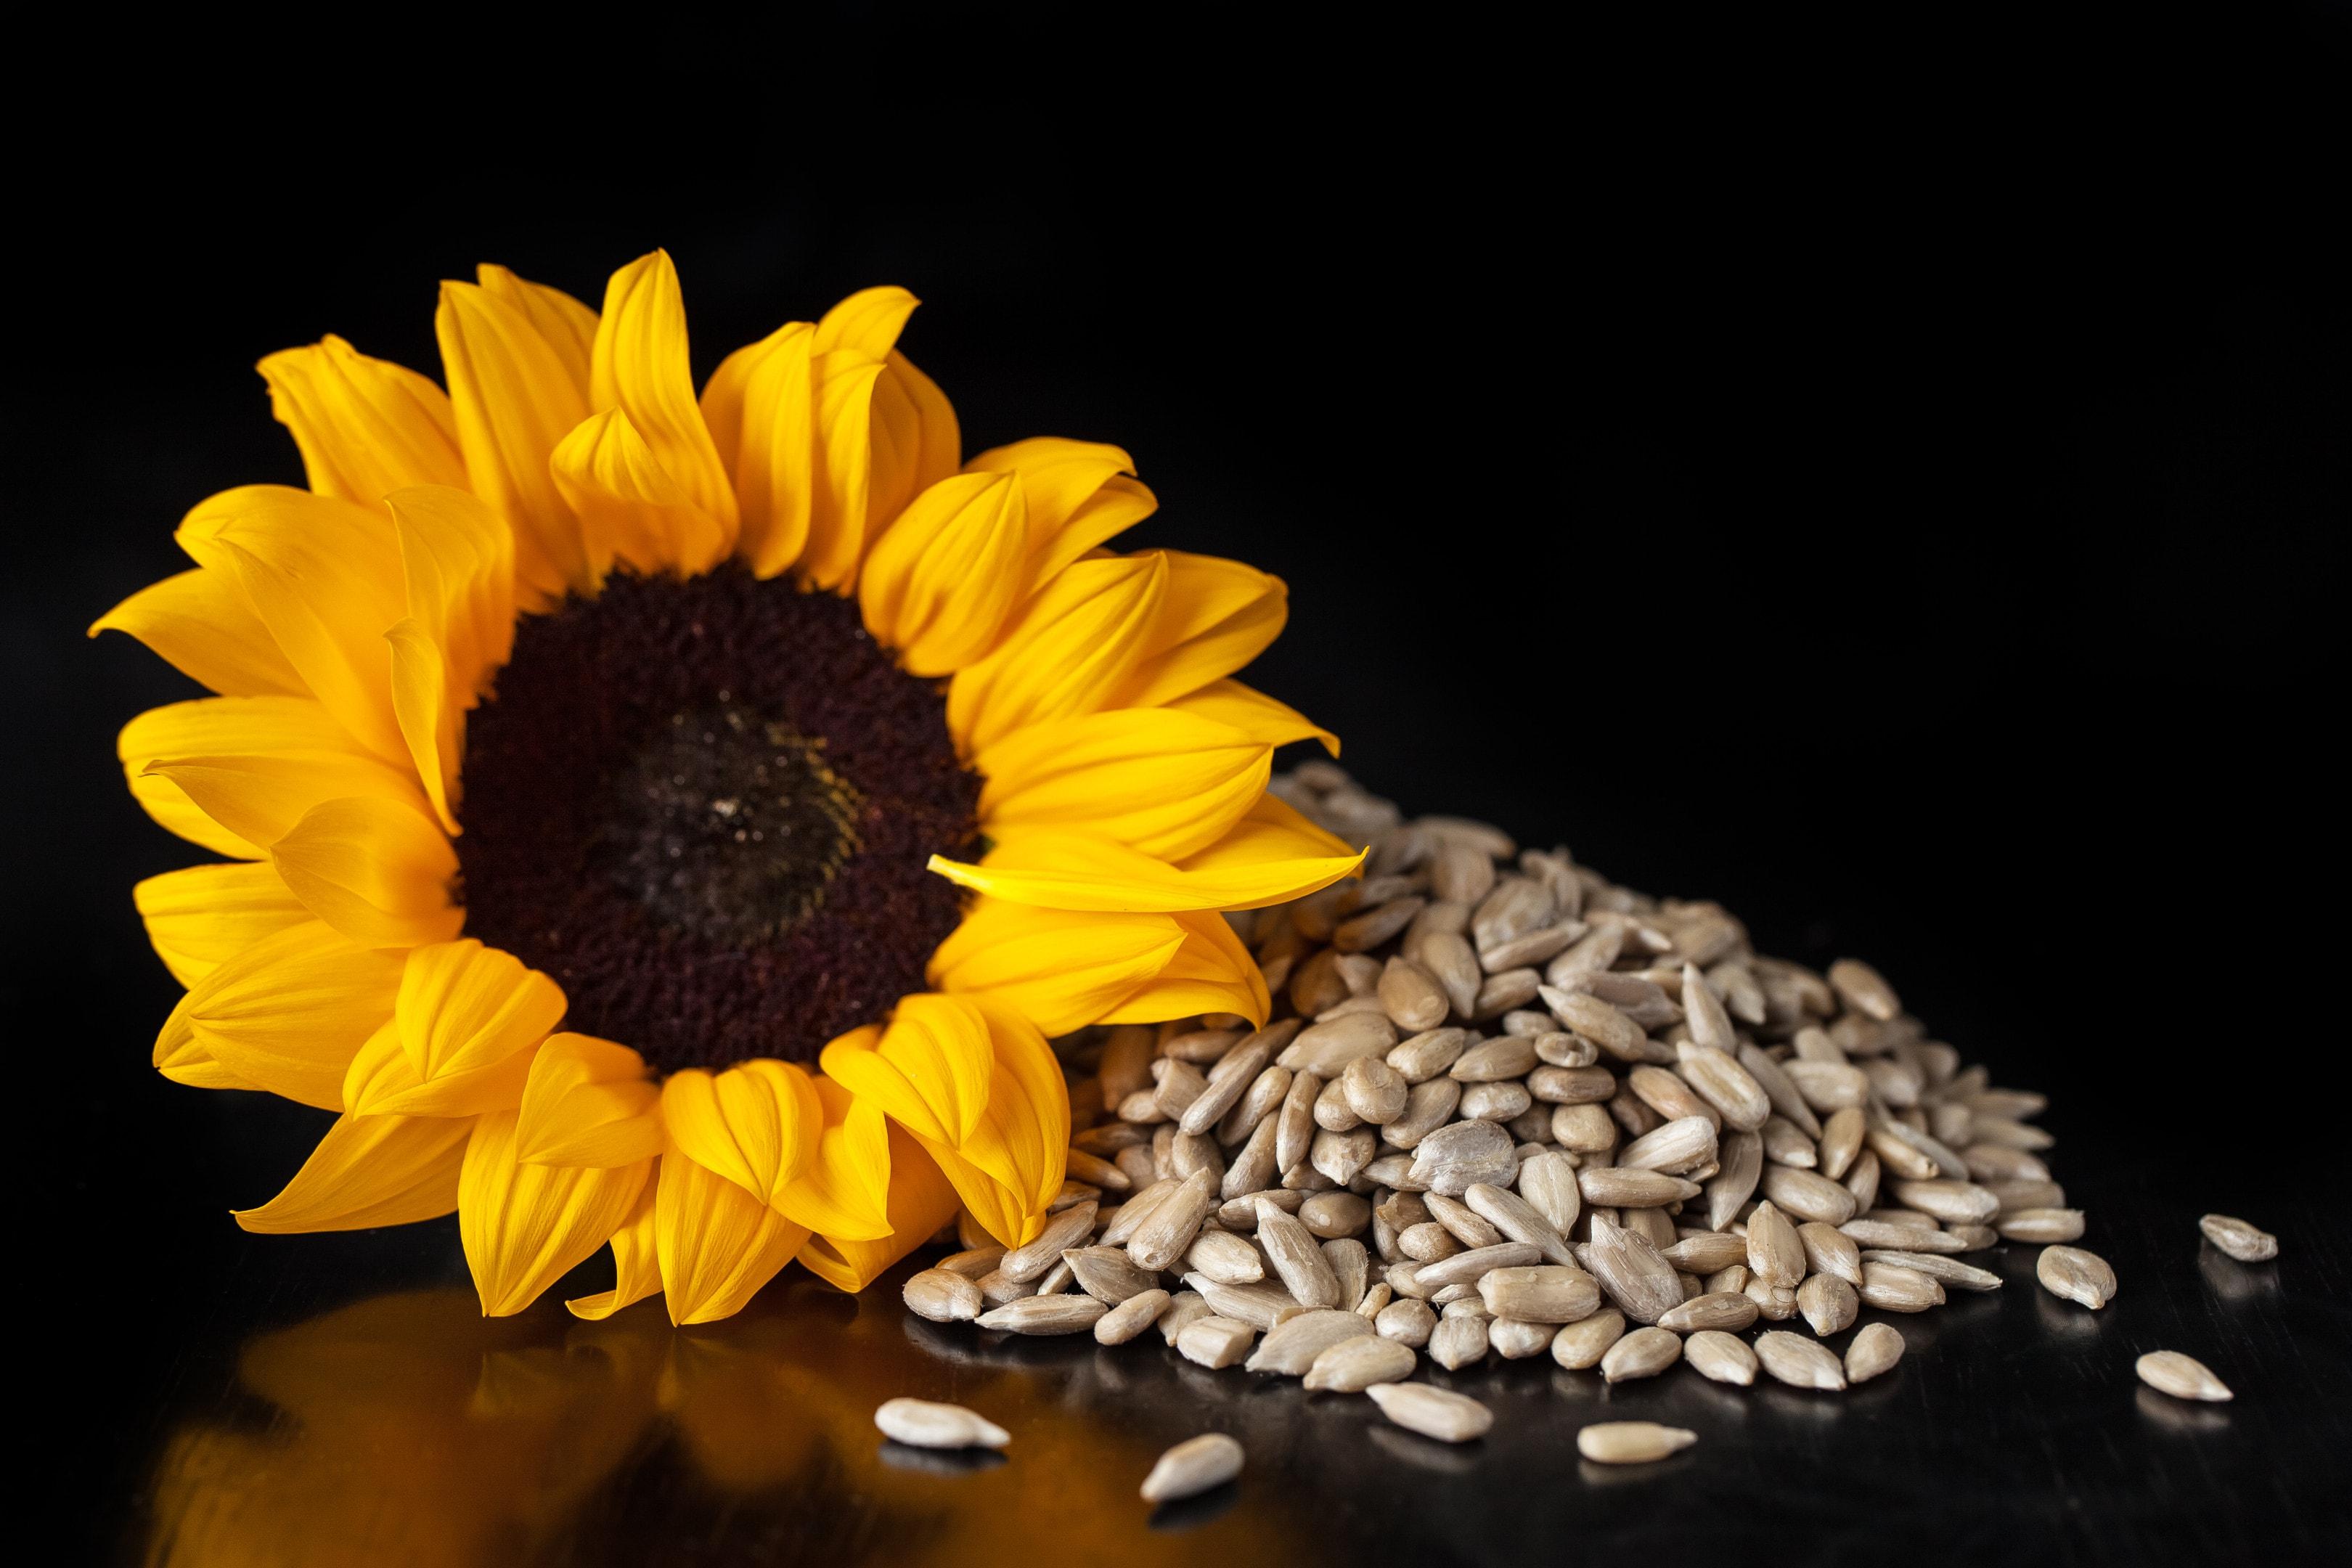 Flower sunflower and peeled sunflower seeds